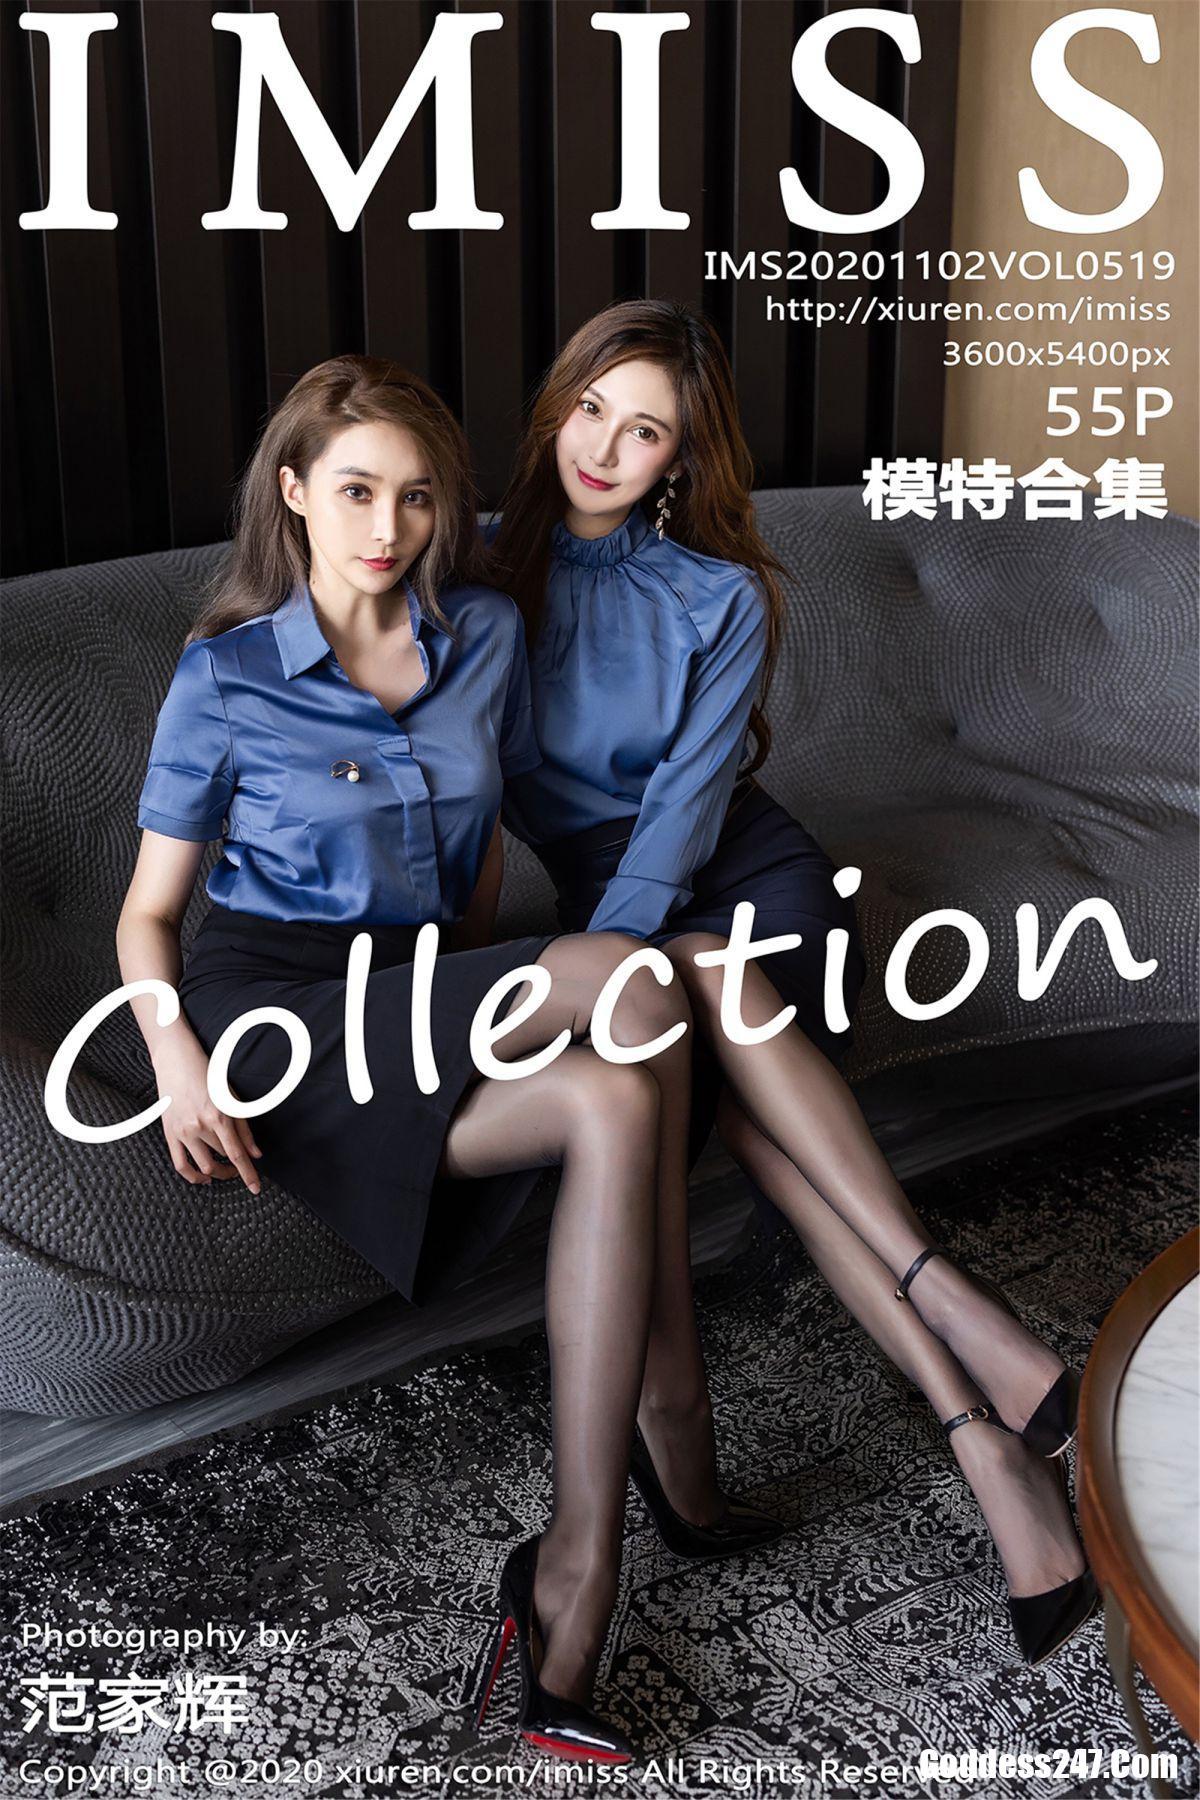 IMiss爱蜜社 Vol.519 模特合集